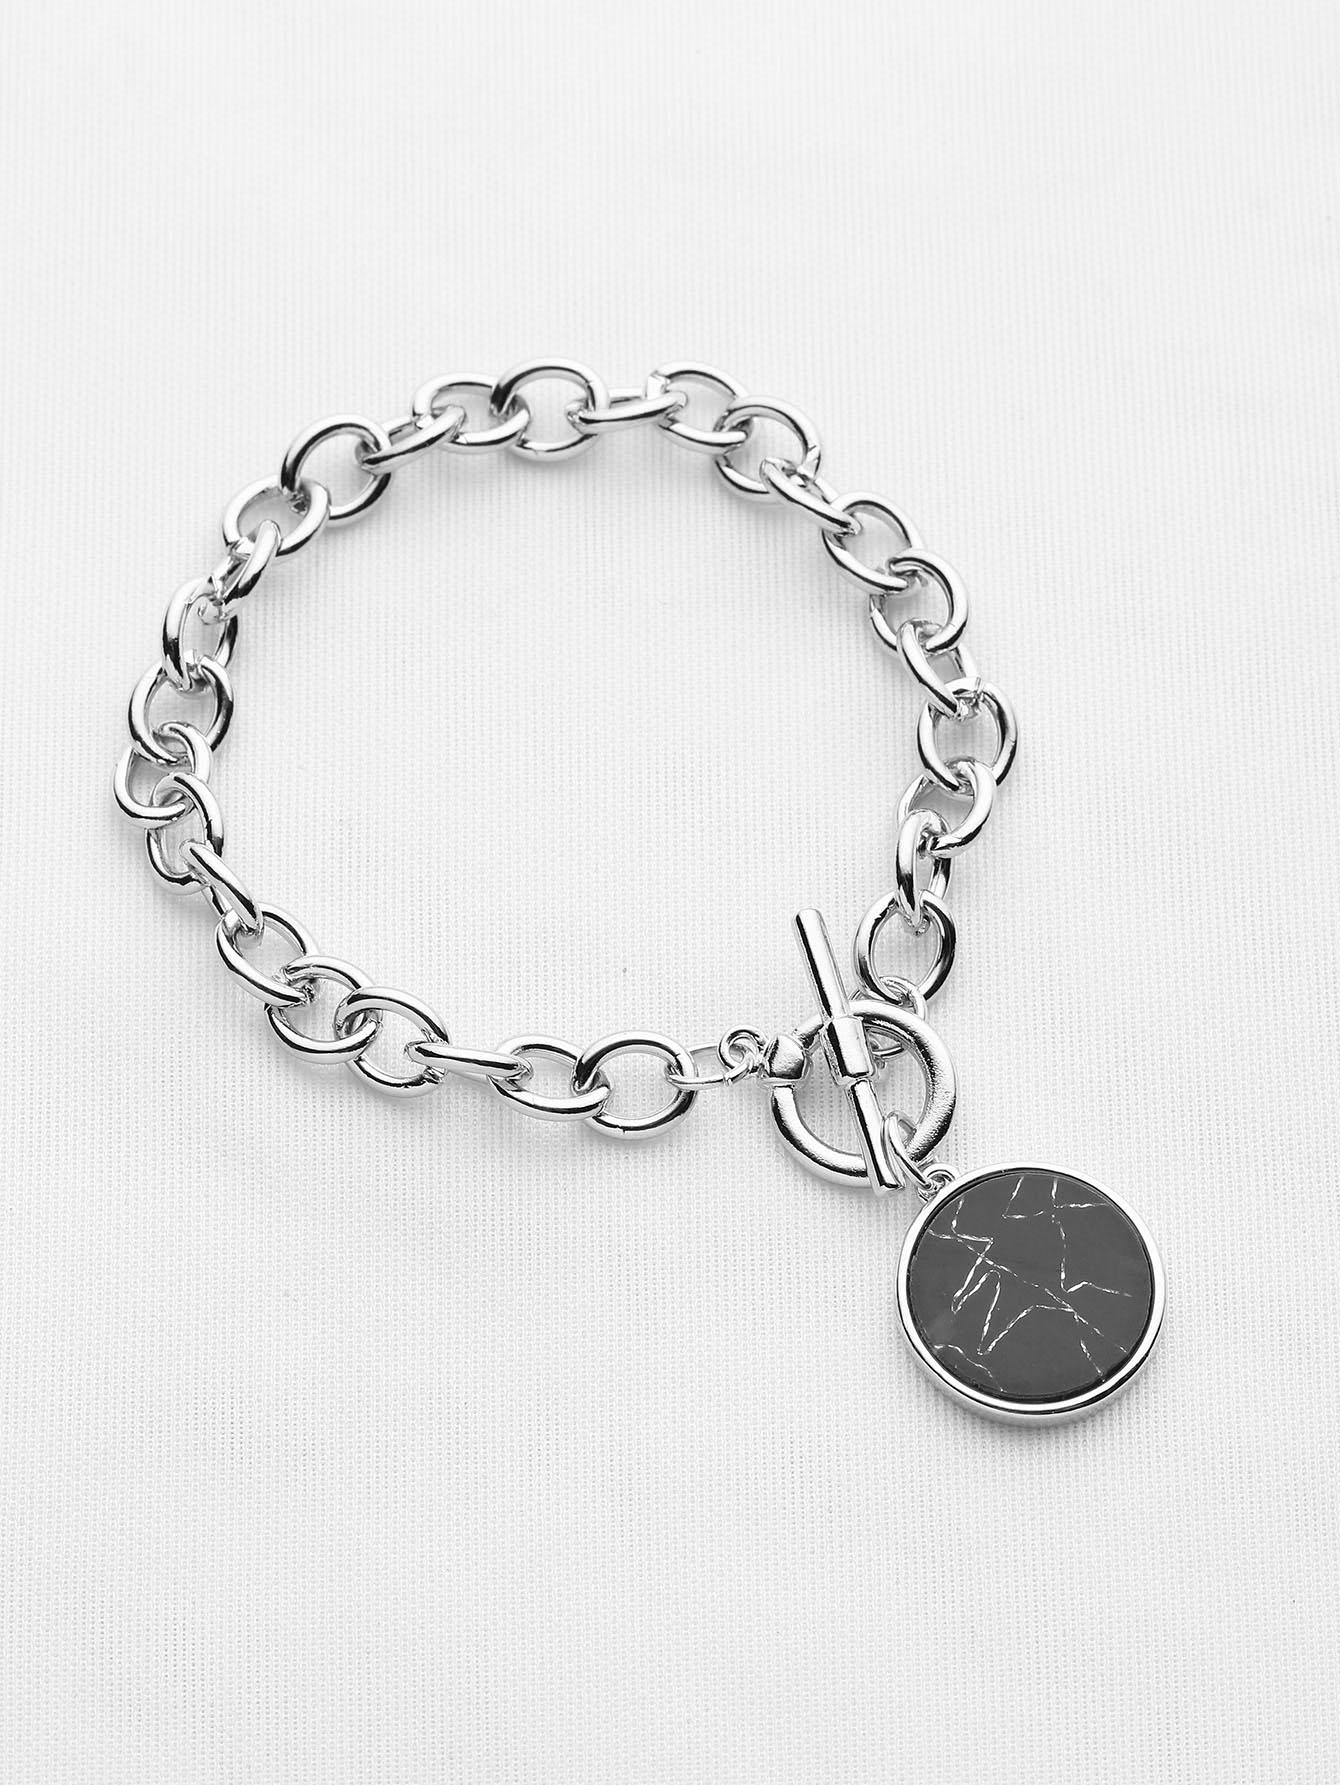 Round Charm Link Bracelet braceletBR170418302